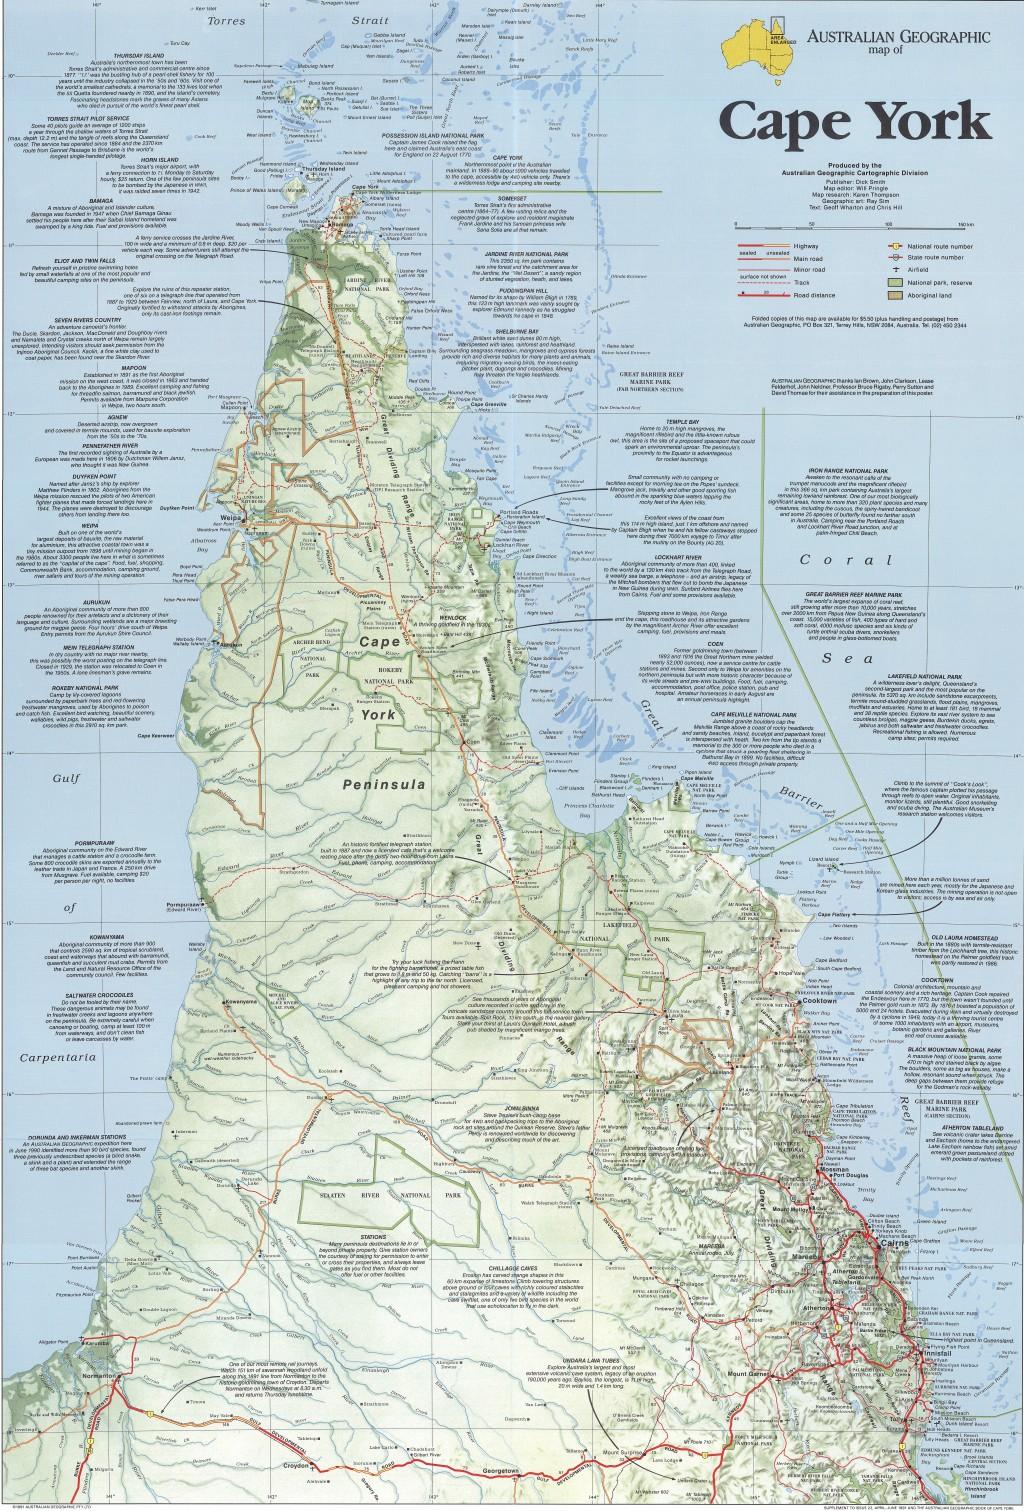 Cape York Map Cape York Peninsula map   Australian Geographic Cape York Map